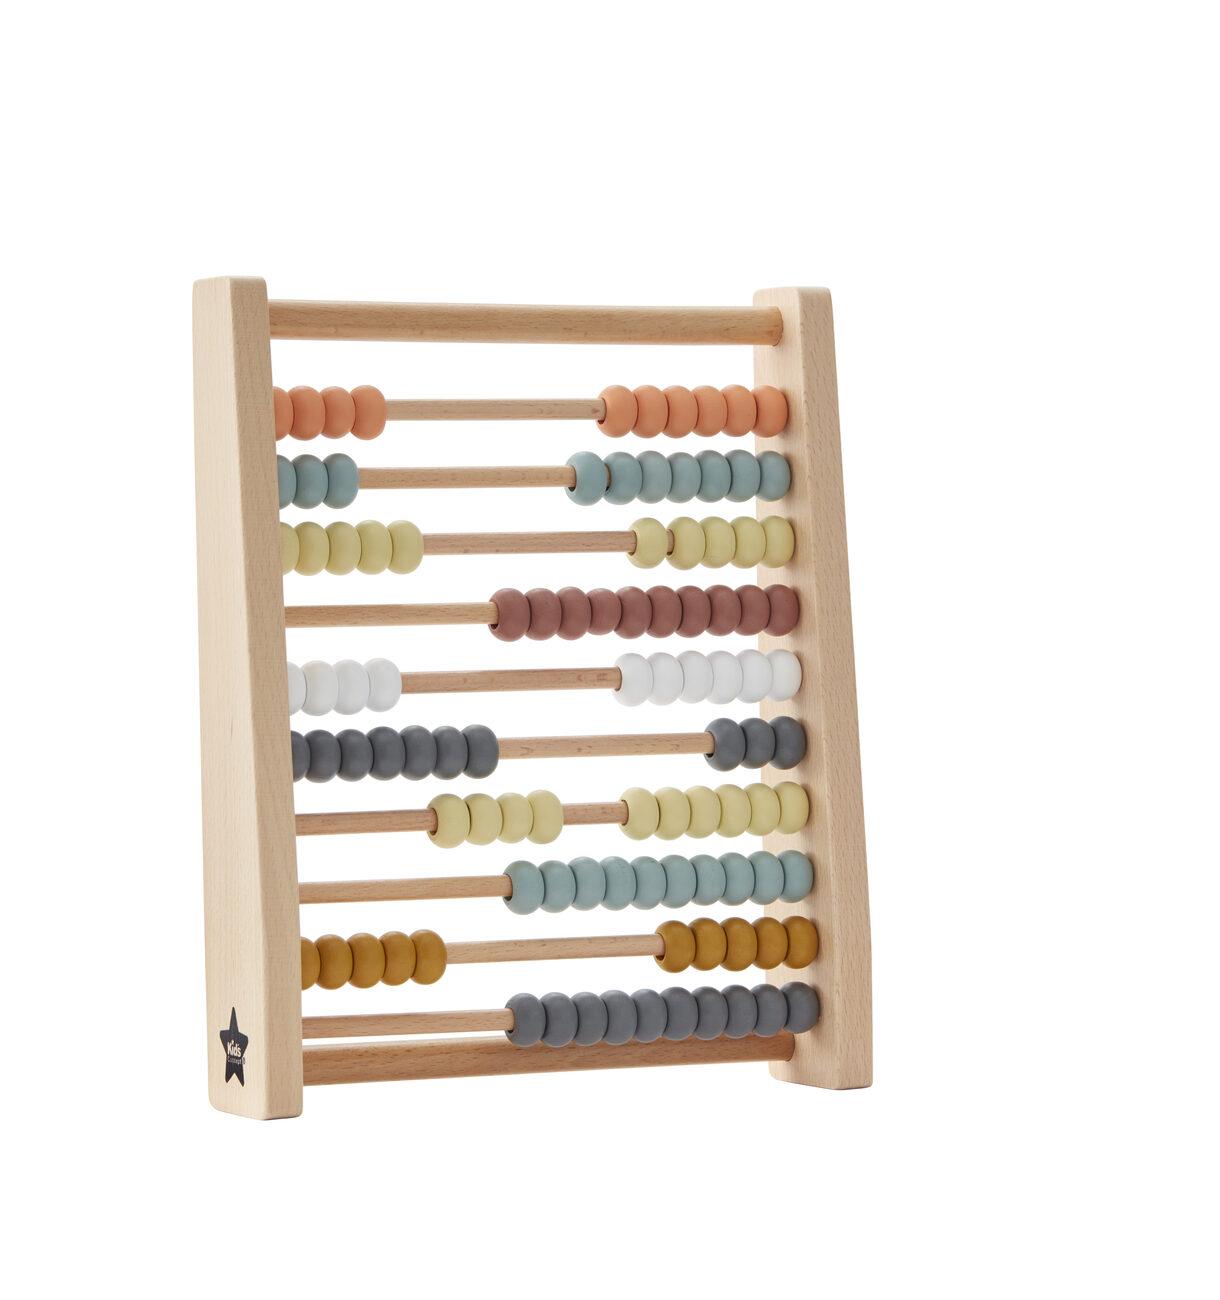 1000194 Abacus Bead Frame_S